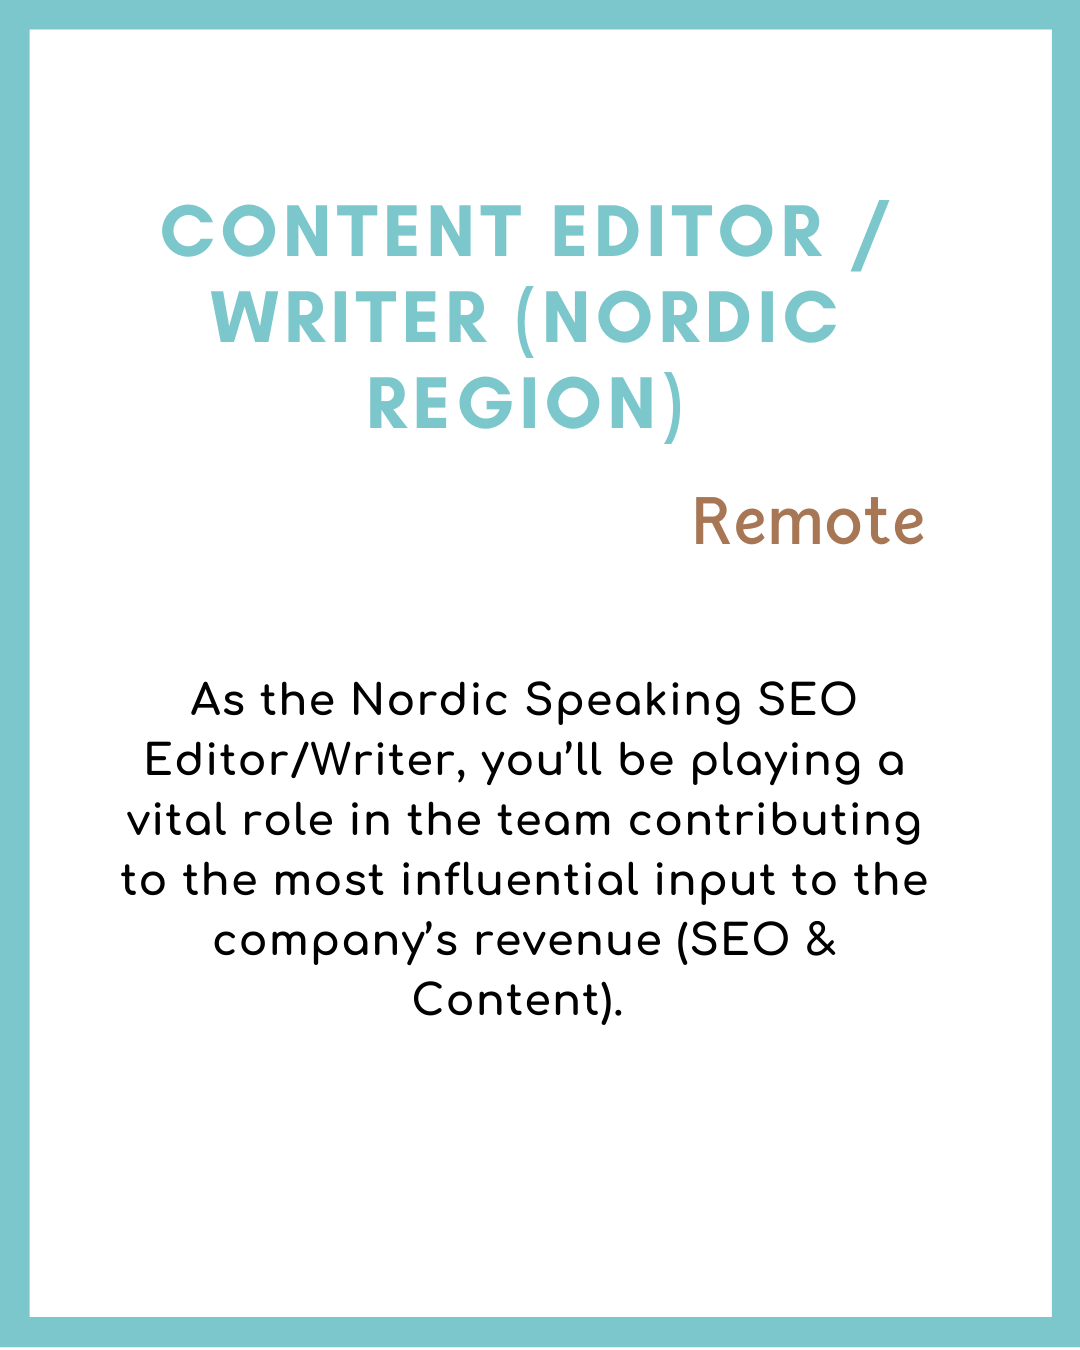 Content Editor / Writer (Nordic Region) Remote Jobs